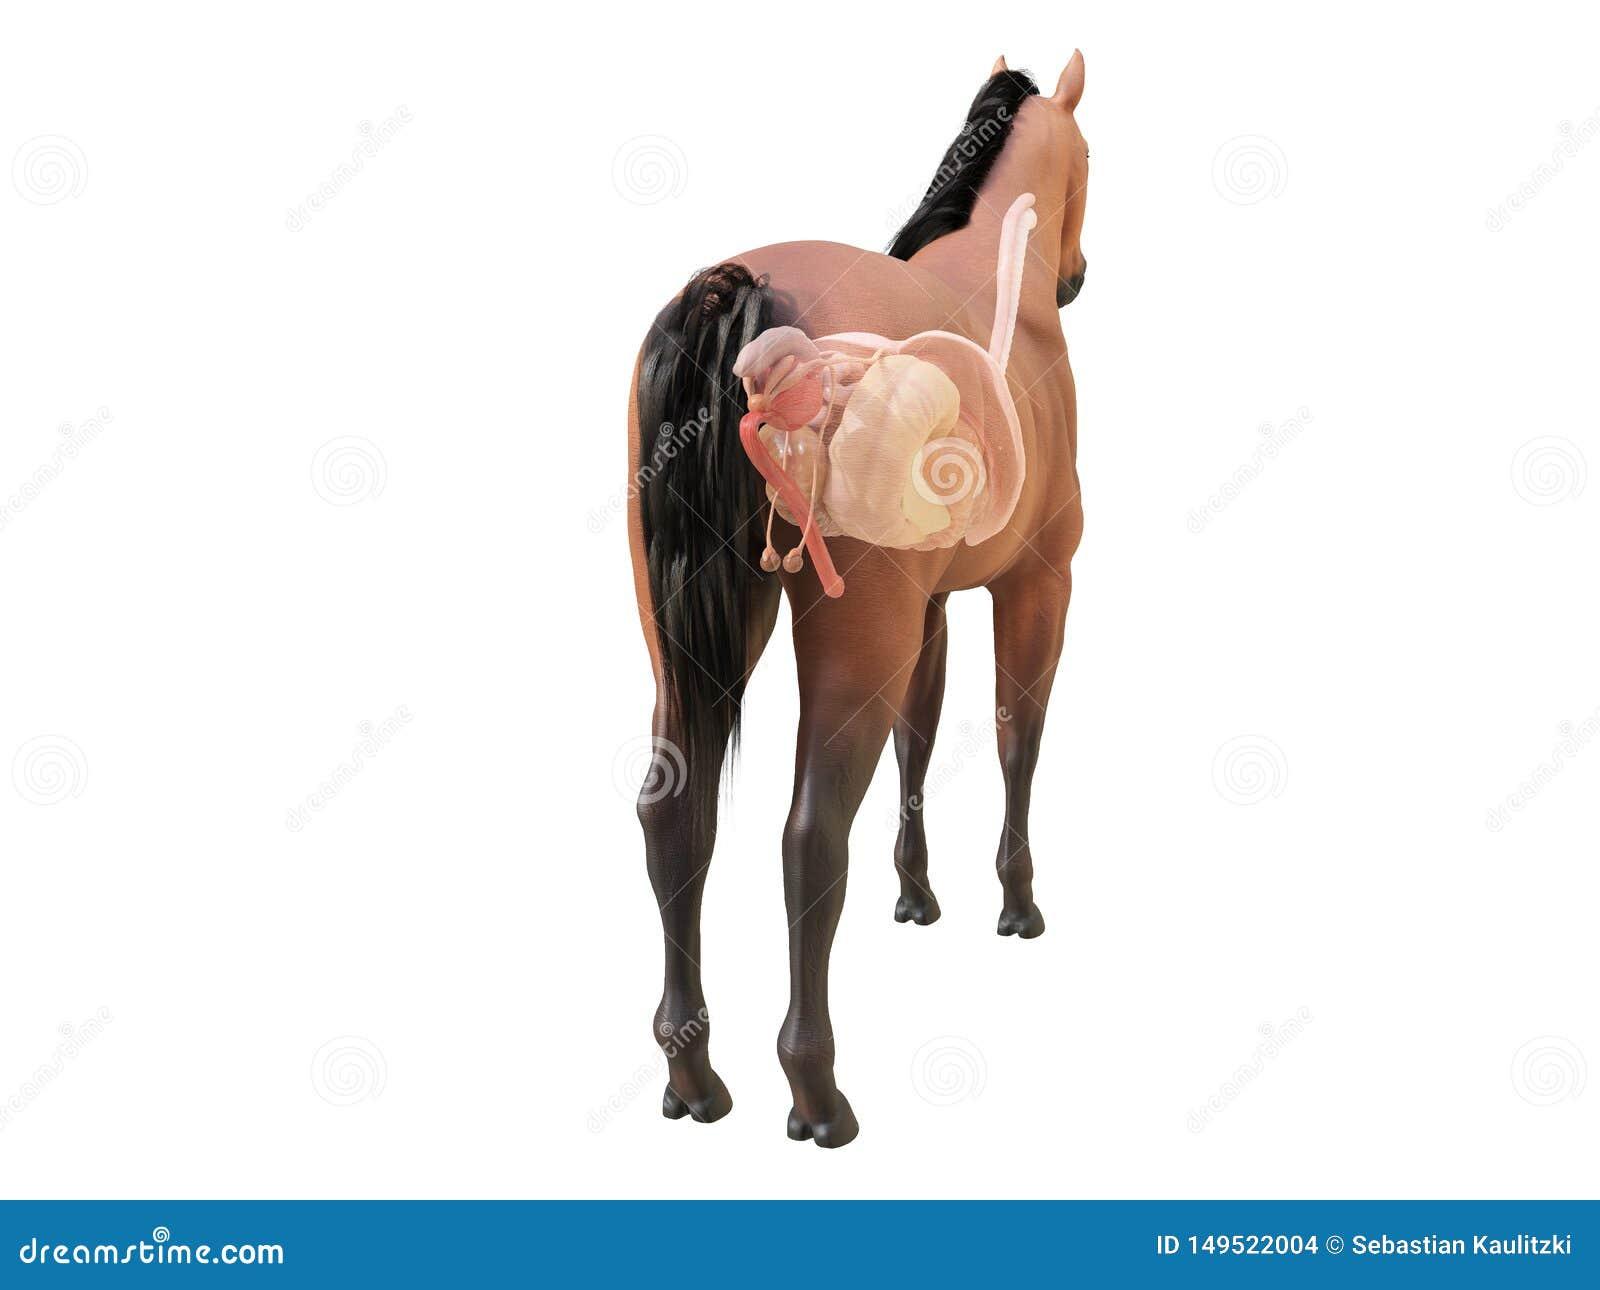 The Horse Anatomy Internal Organs Stock Illustration Illustration Of Health Orthopedic 149522004